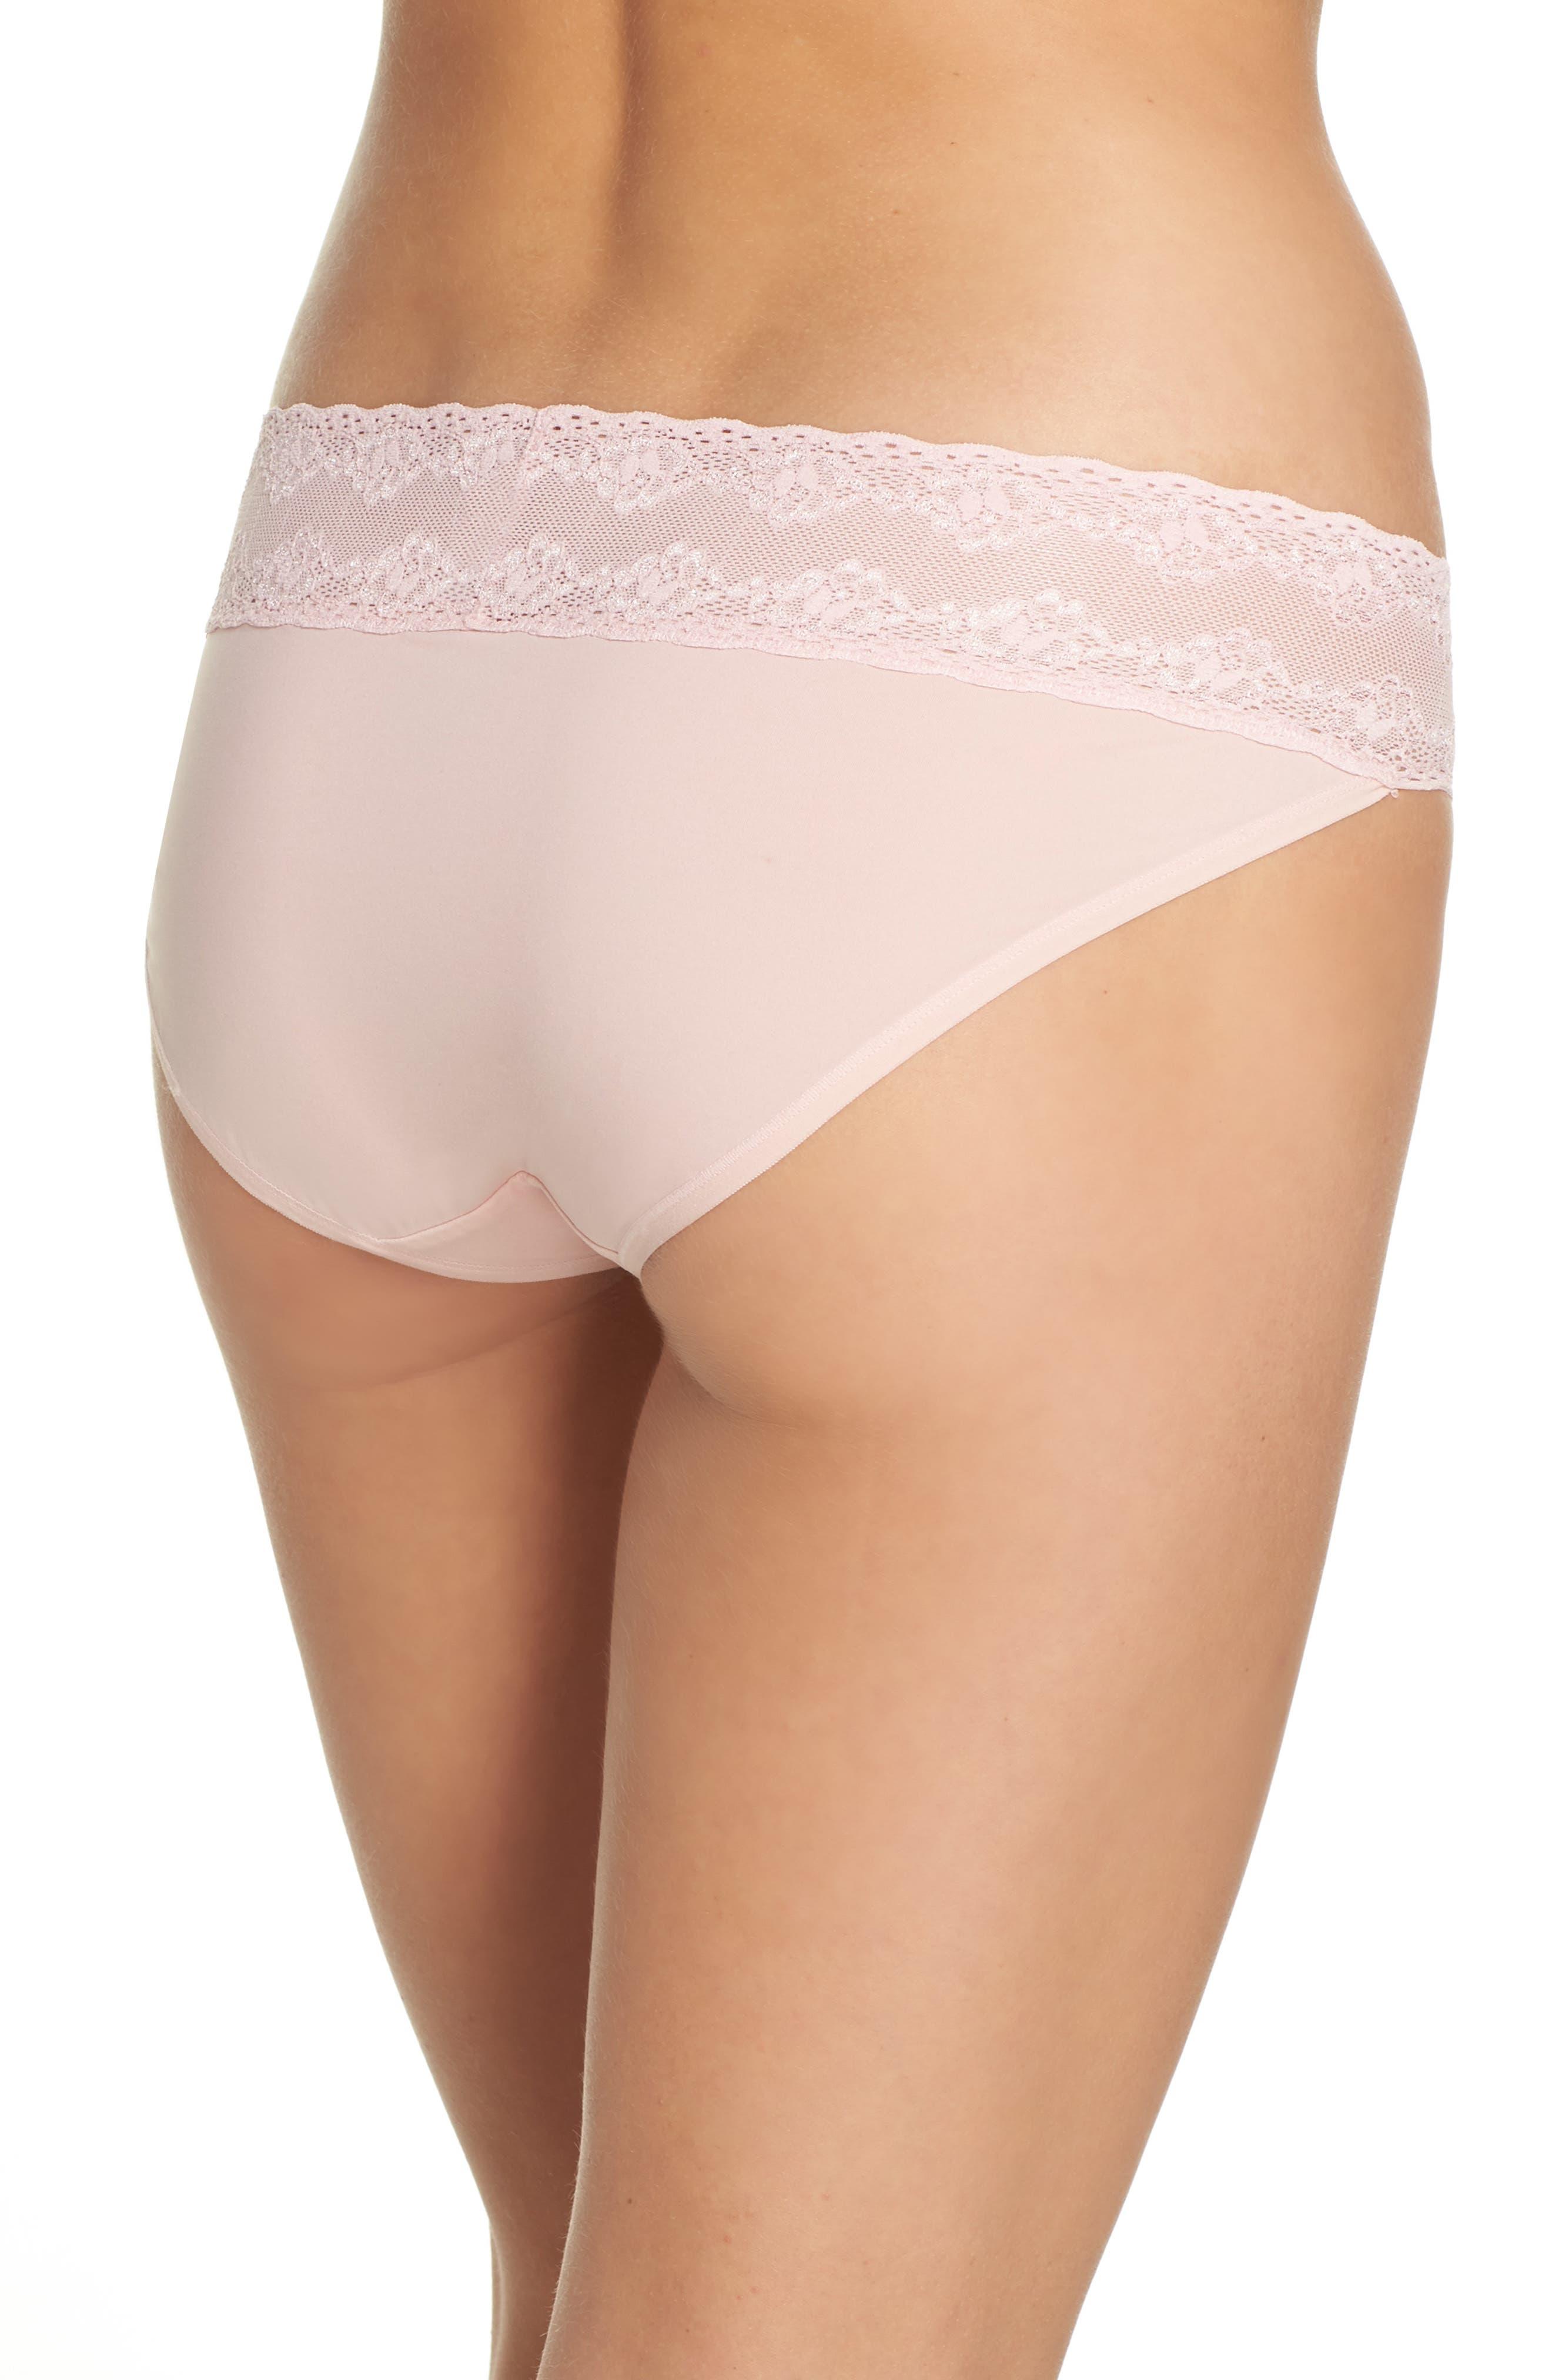 Alternate Image 2  - Natori Bliss Perfection Bikini (3 for $45)